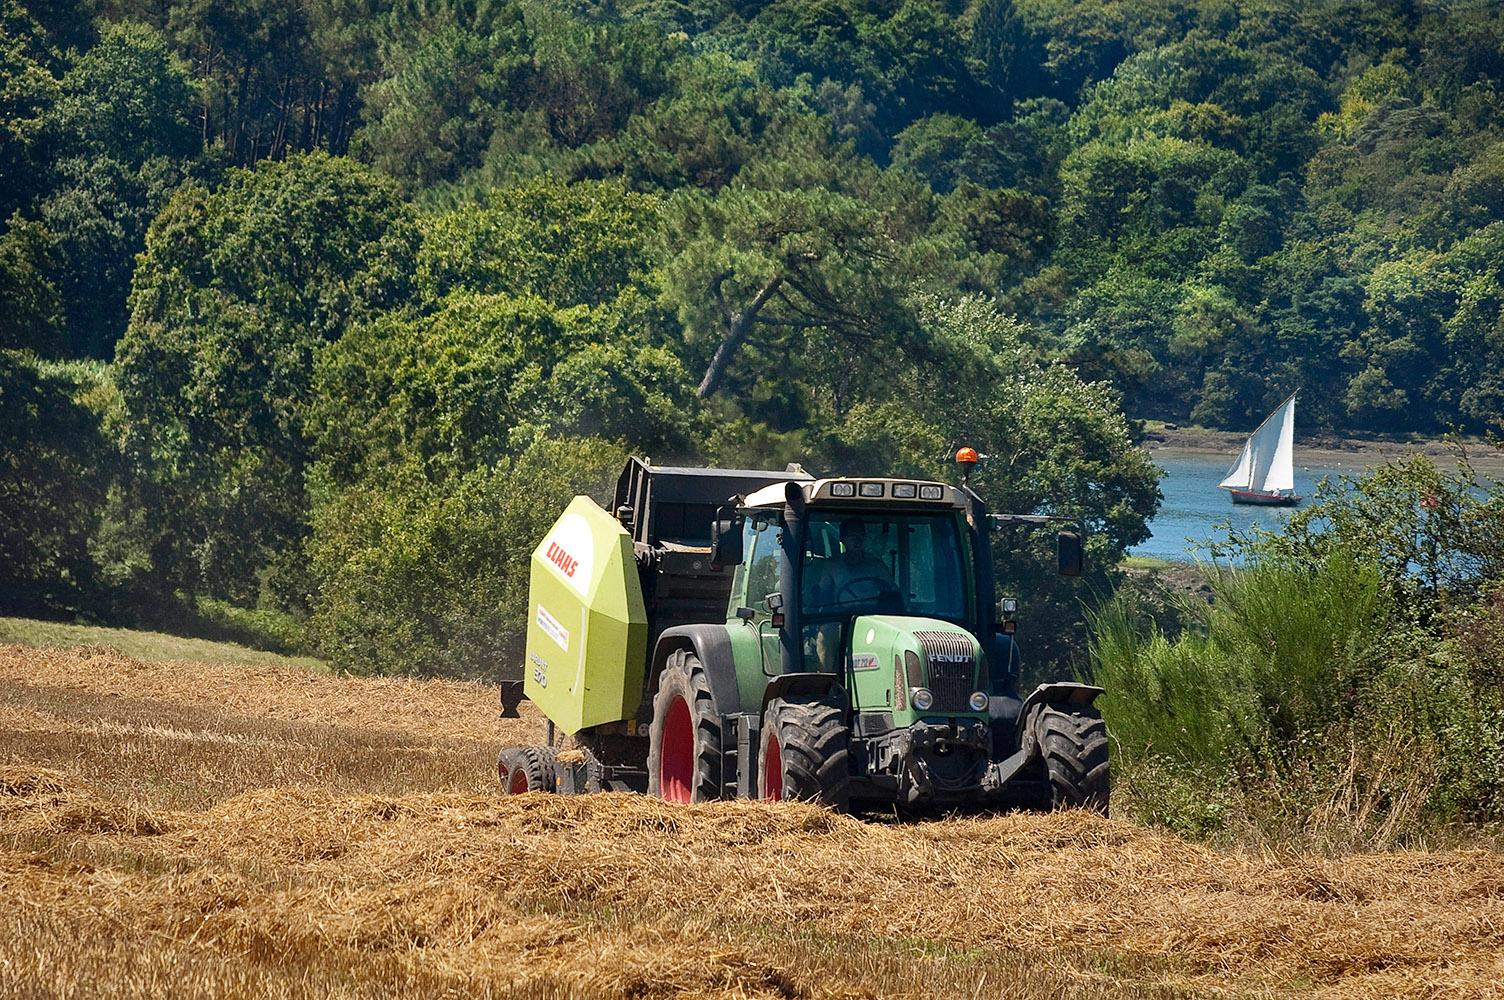 © Studio Niko : Agriculture dans le Golfe du Morbihan